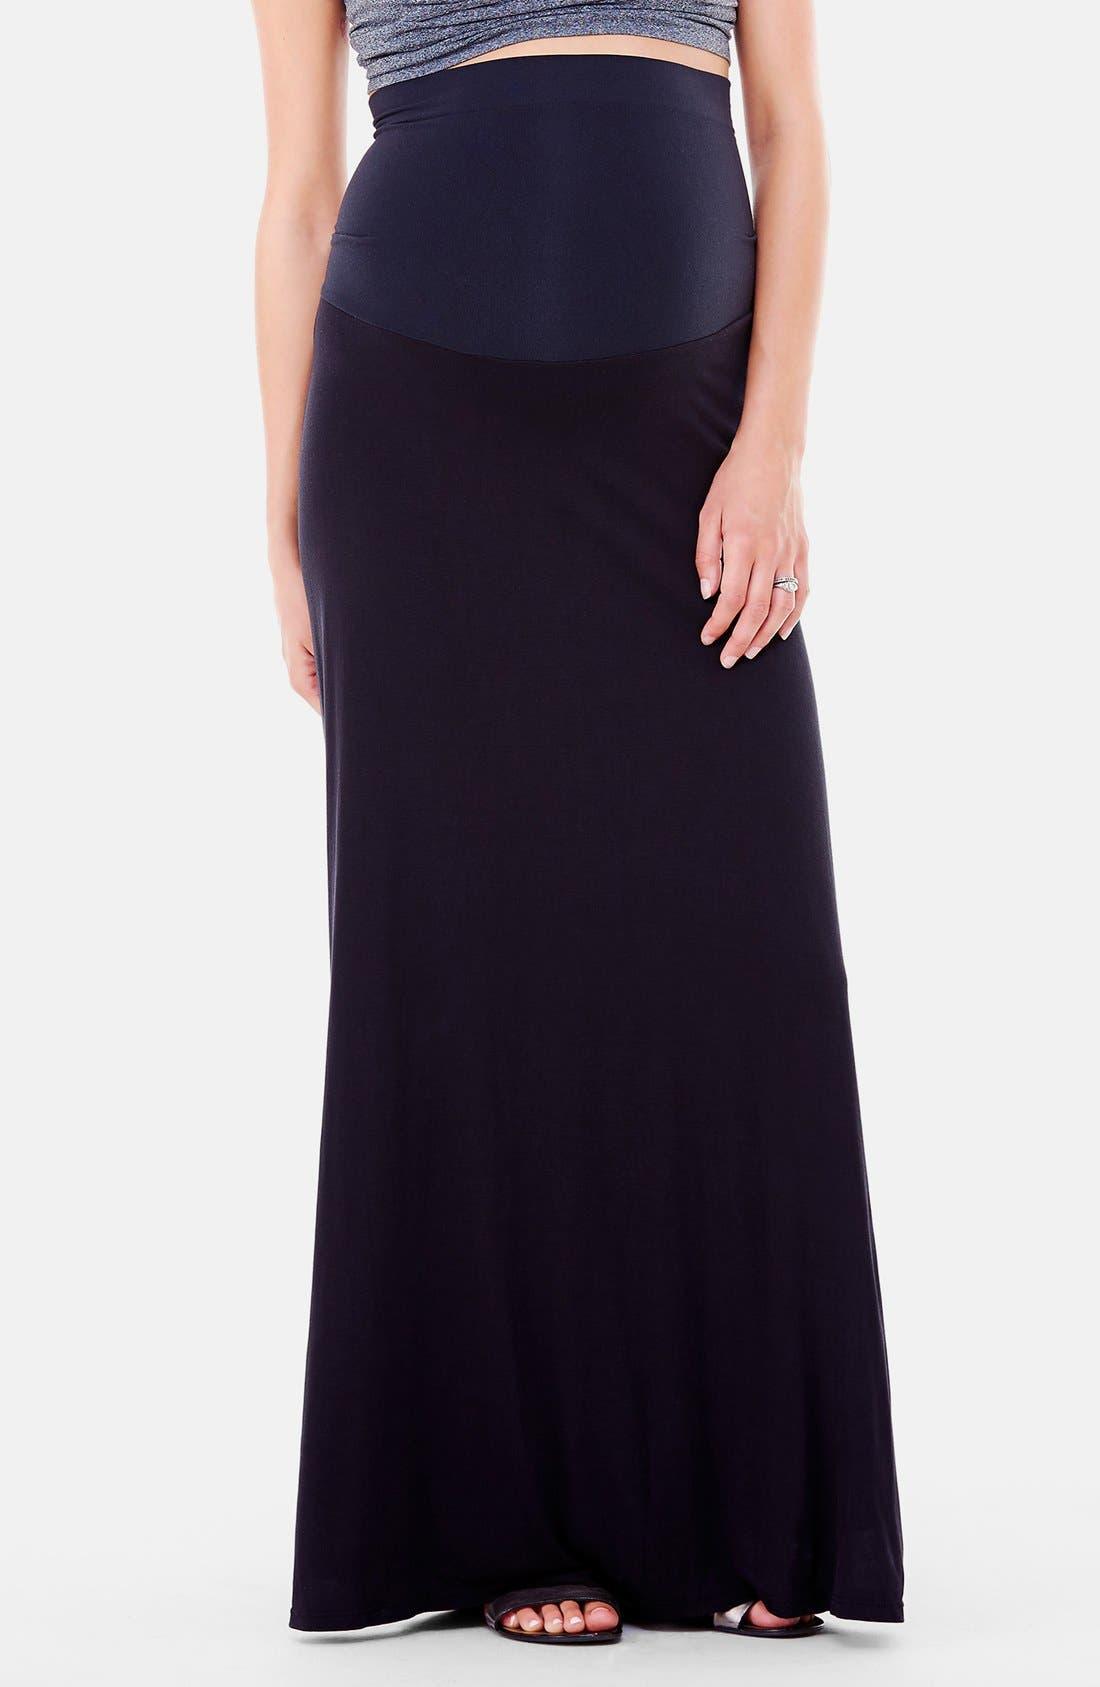 Alternate Image 1 Selected - Ingrid & Isabel®'Flowy' Maxi Maternity Skirt